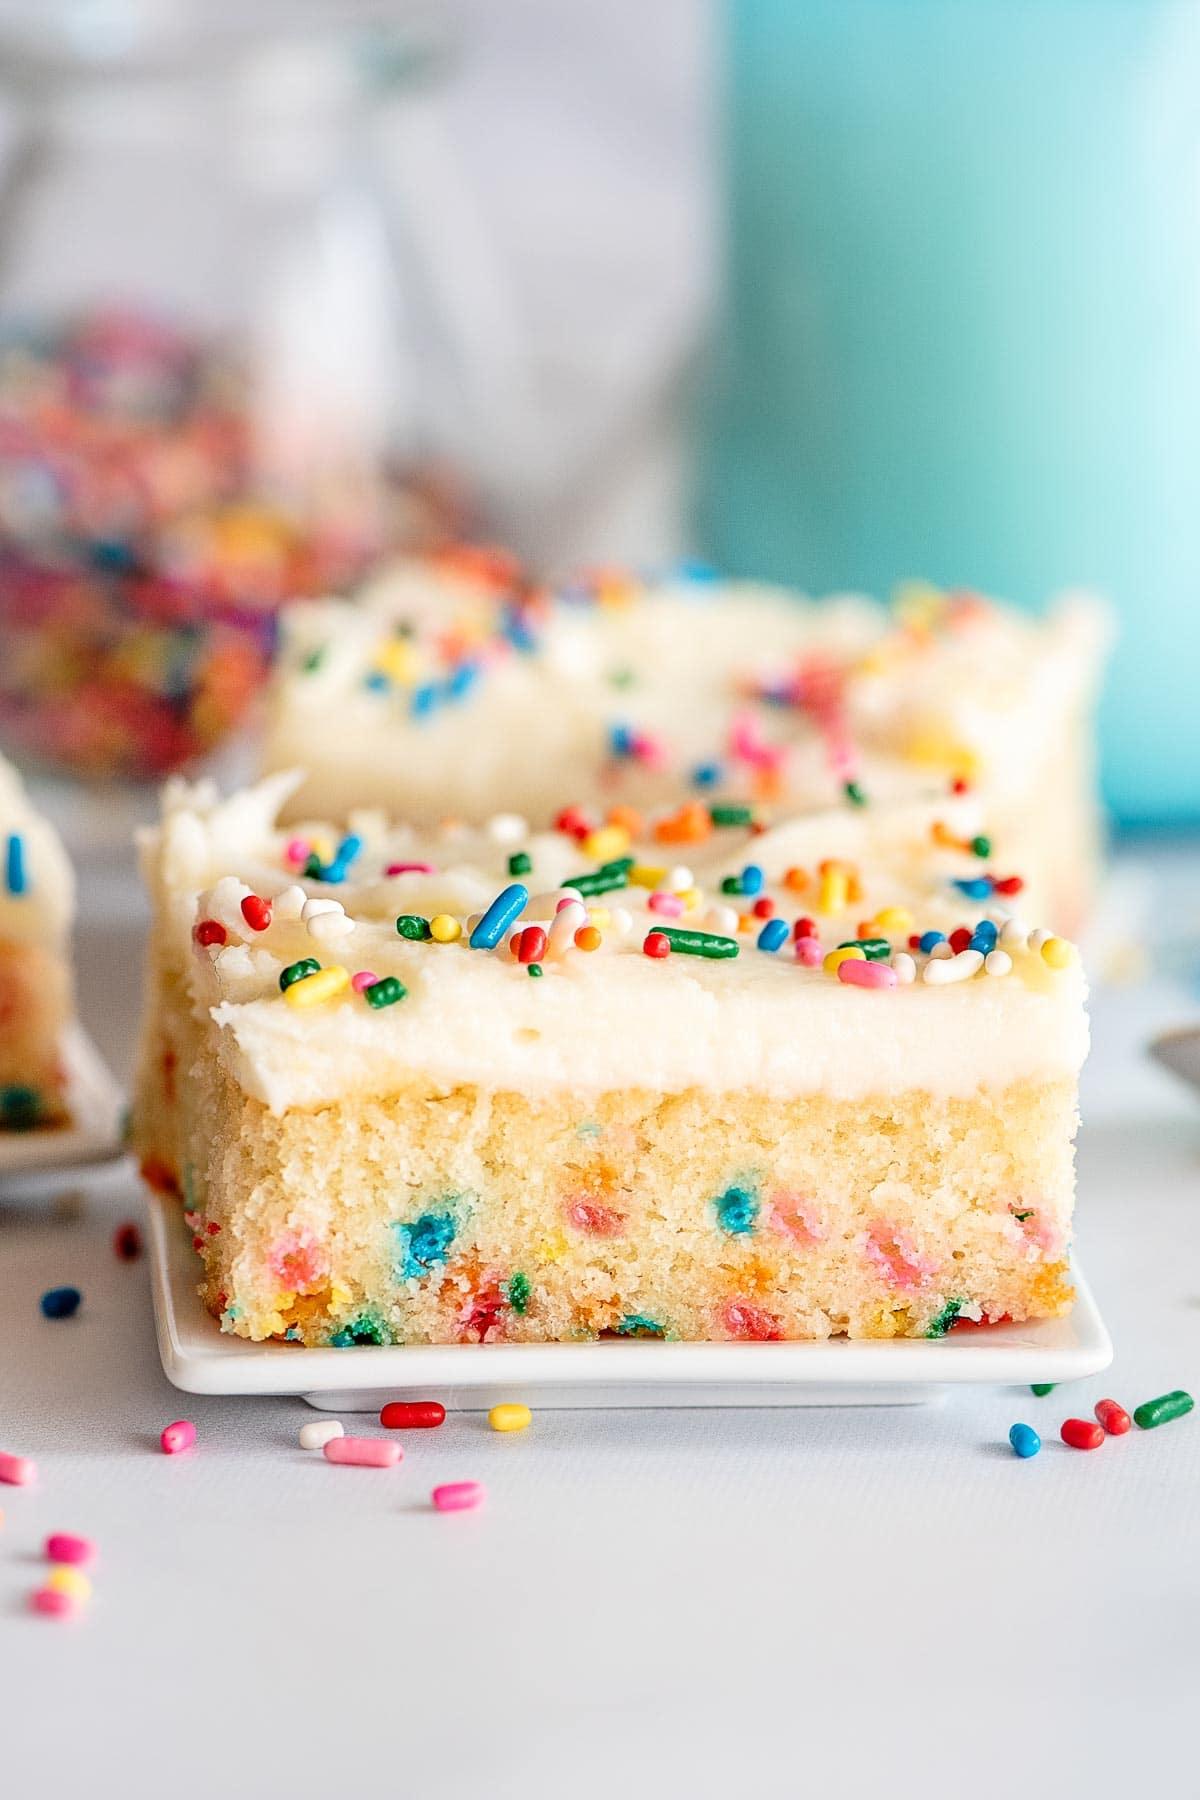 funfetti cake slice from side